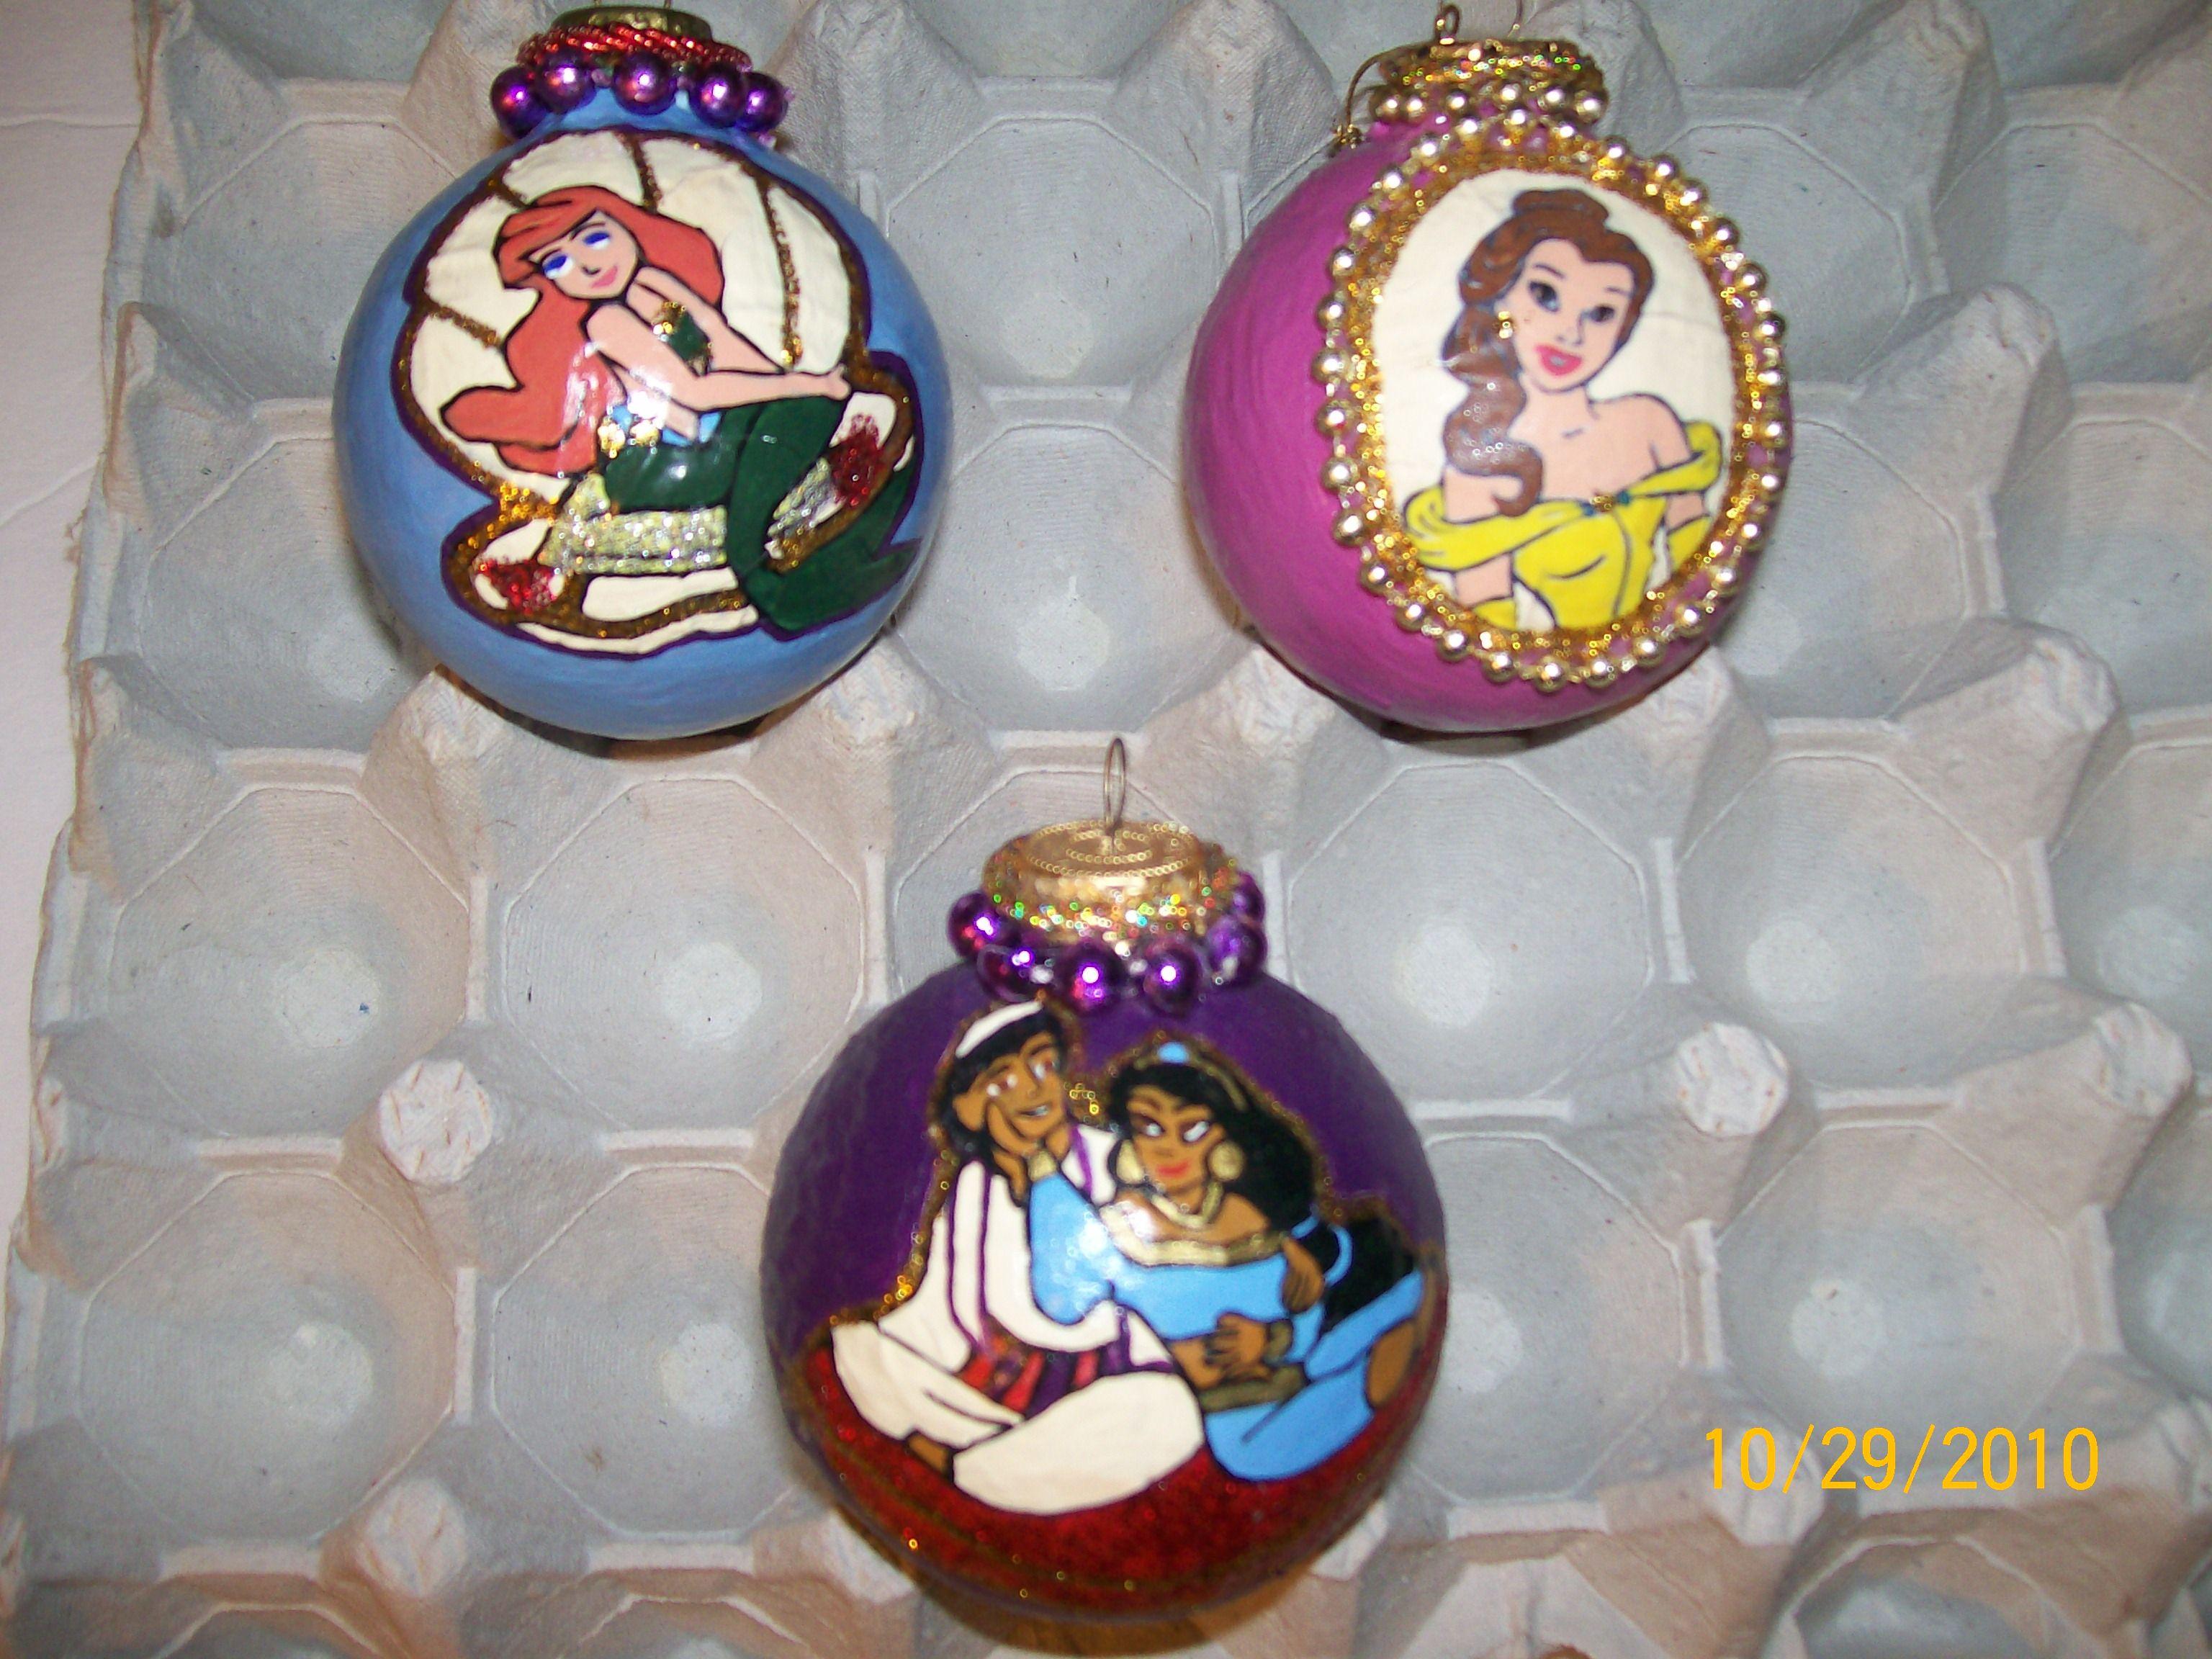 Disney Princess Homemade Ornaments Arielle Belle And Jasmine Disney Christmas Ornaments Disney Christmas Tree Homemade Christmas Decorations